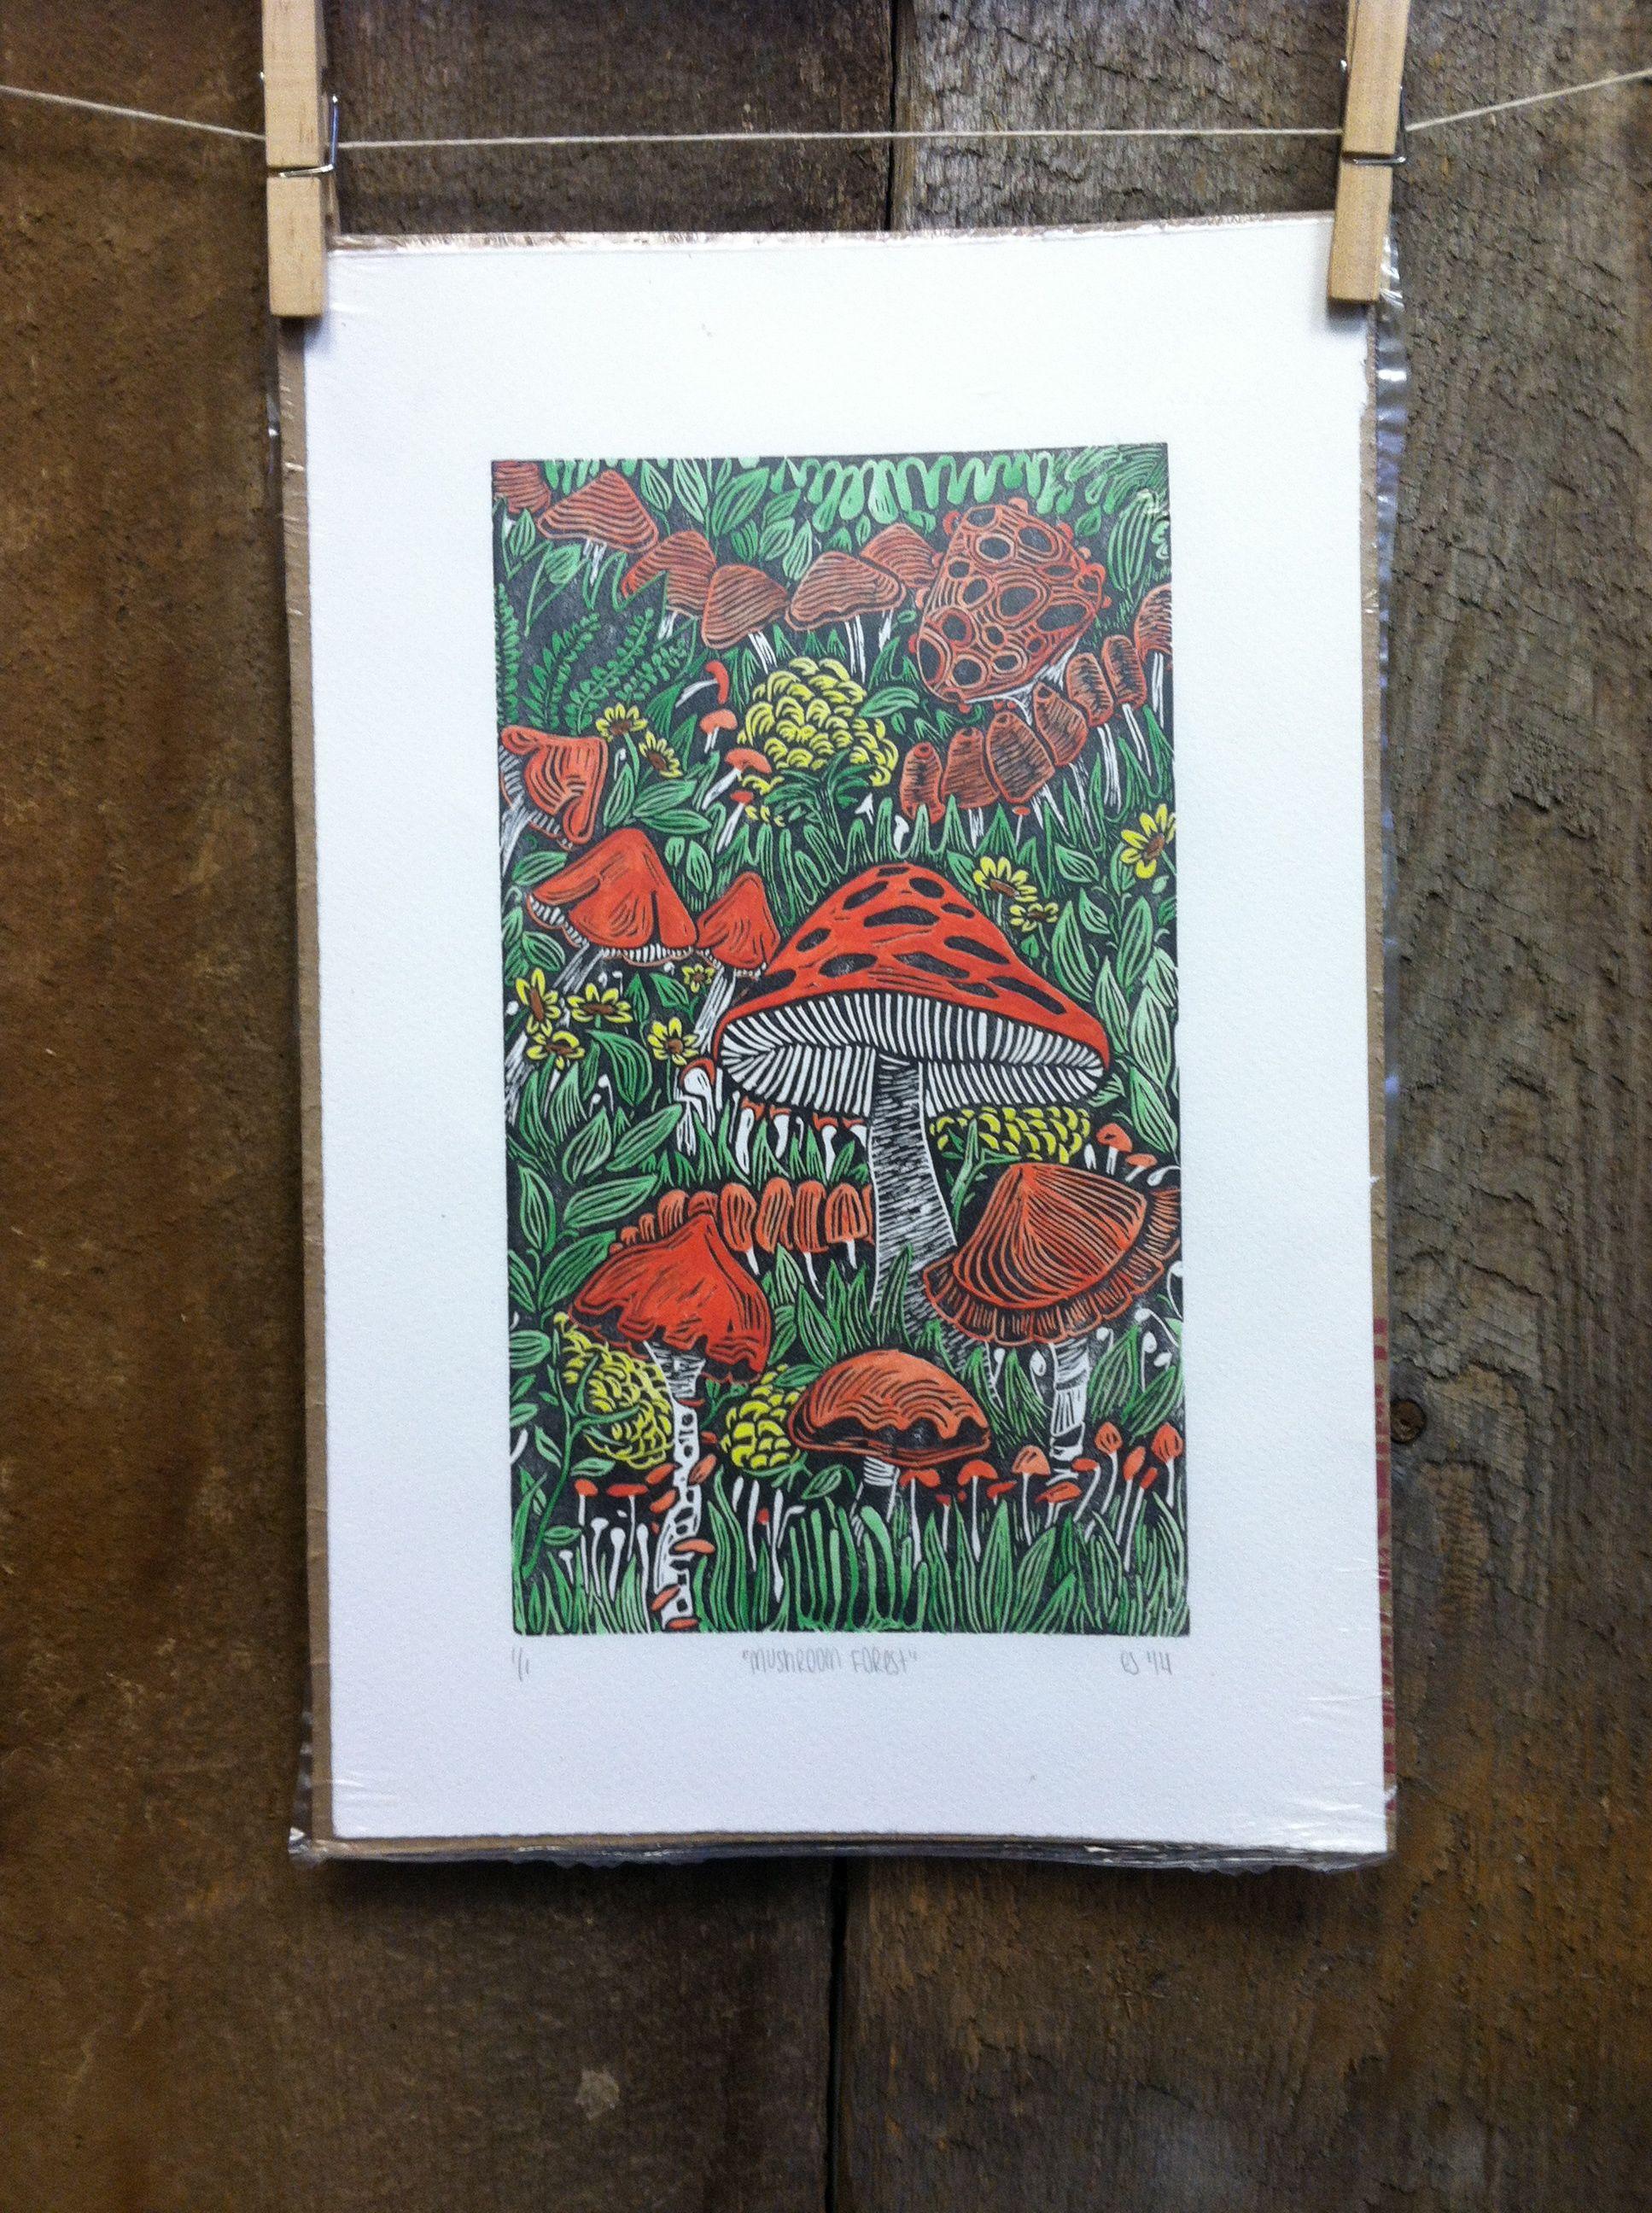 Mushroom Forest Linocut Print Colored Linocut Prints Linocut Print